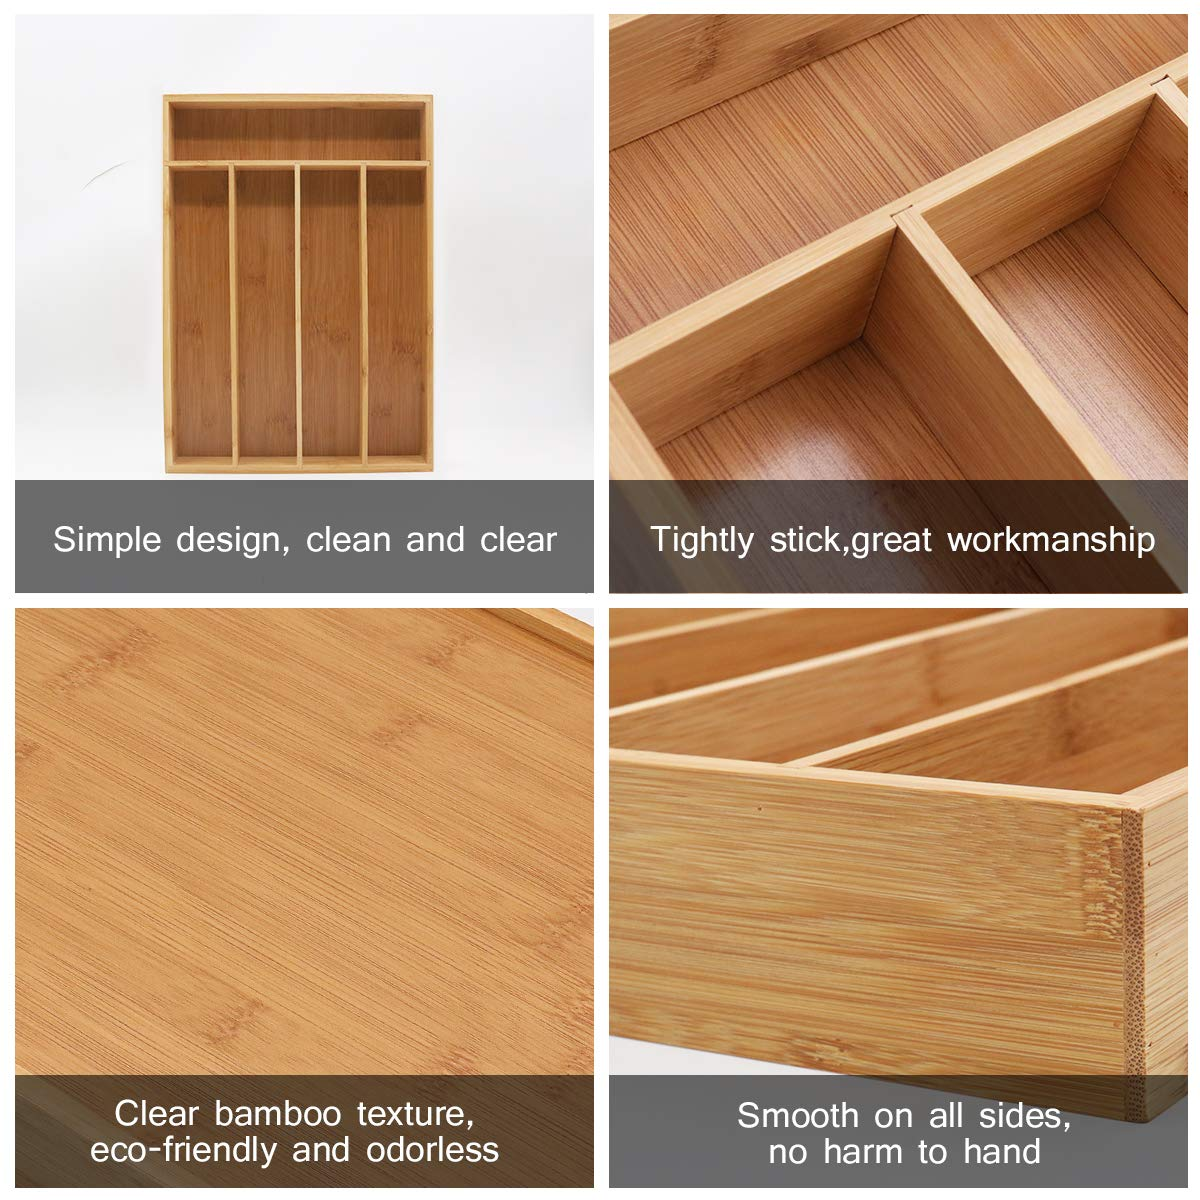 Keyfun Organizers 5-Slot Bamboo Cutlery Drawer Organizer